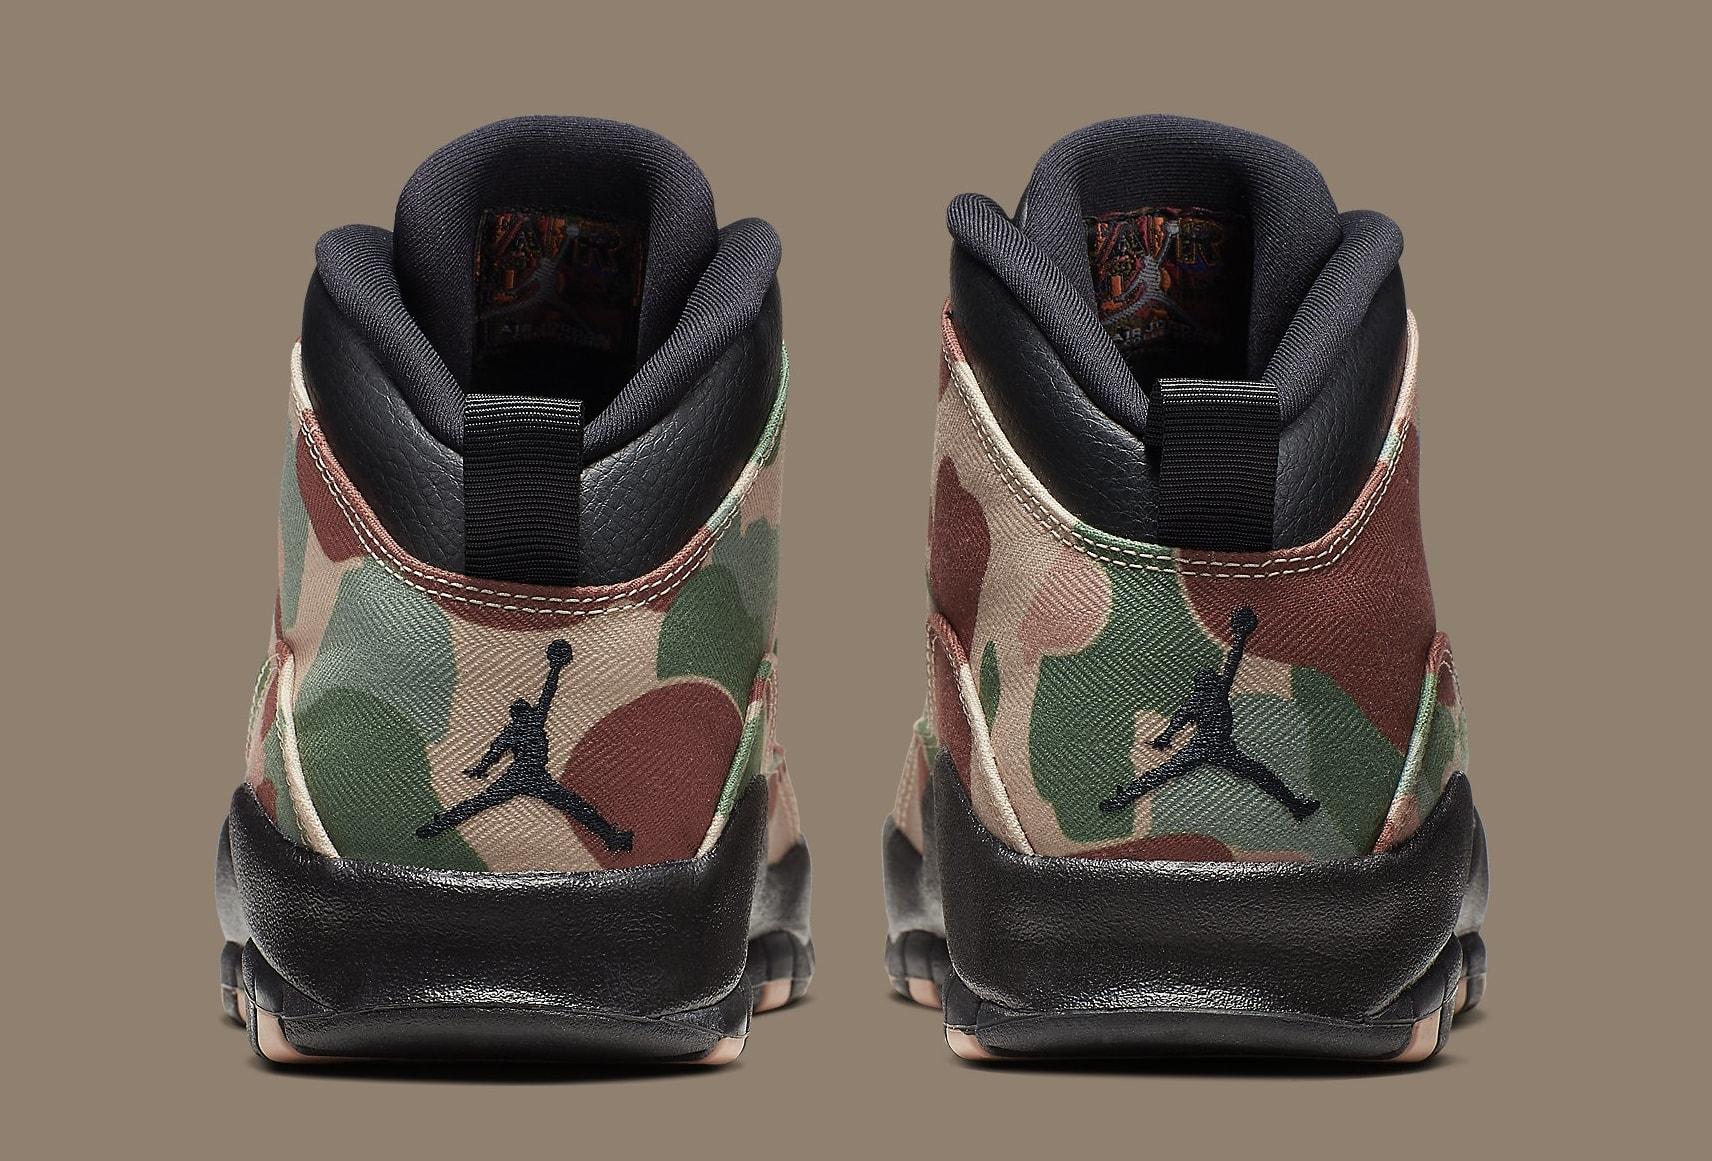 air-jordan-10-x-desert-camo-310805-200-heel